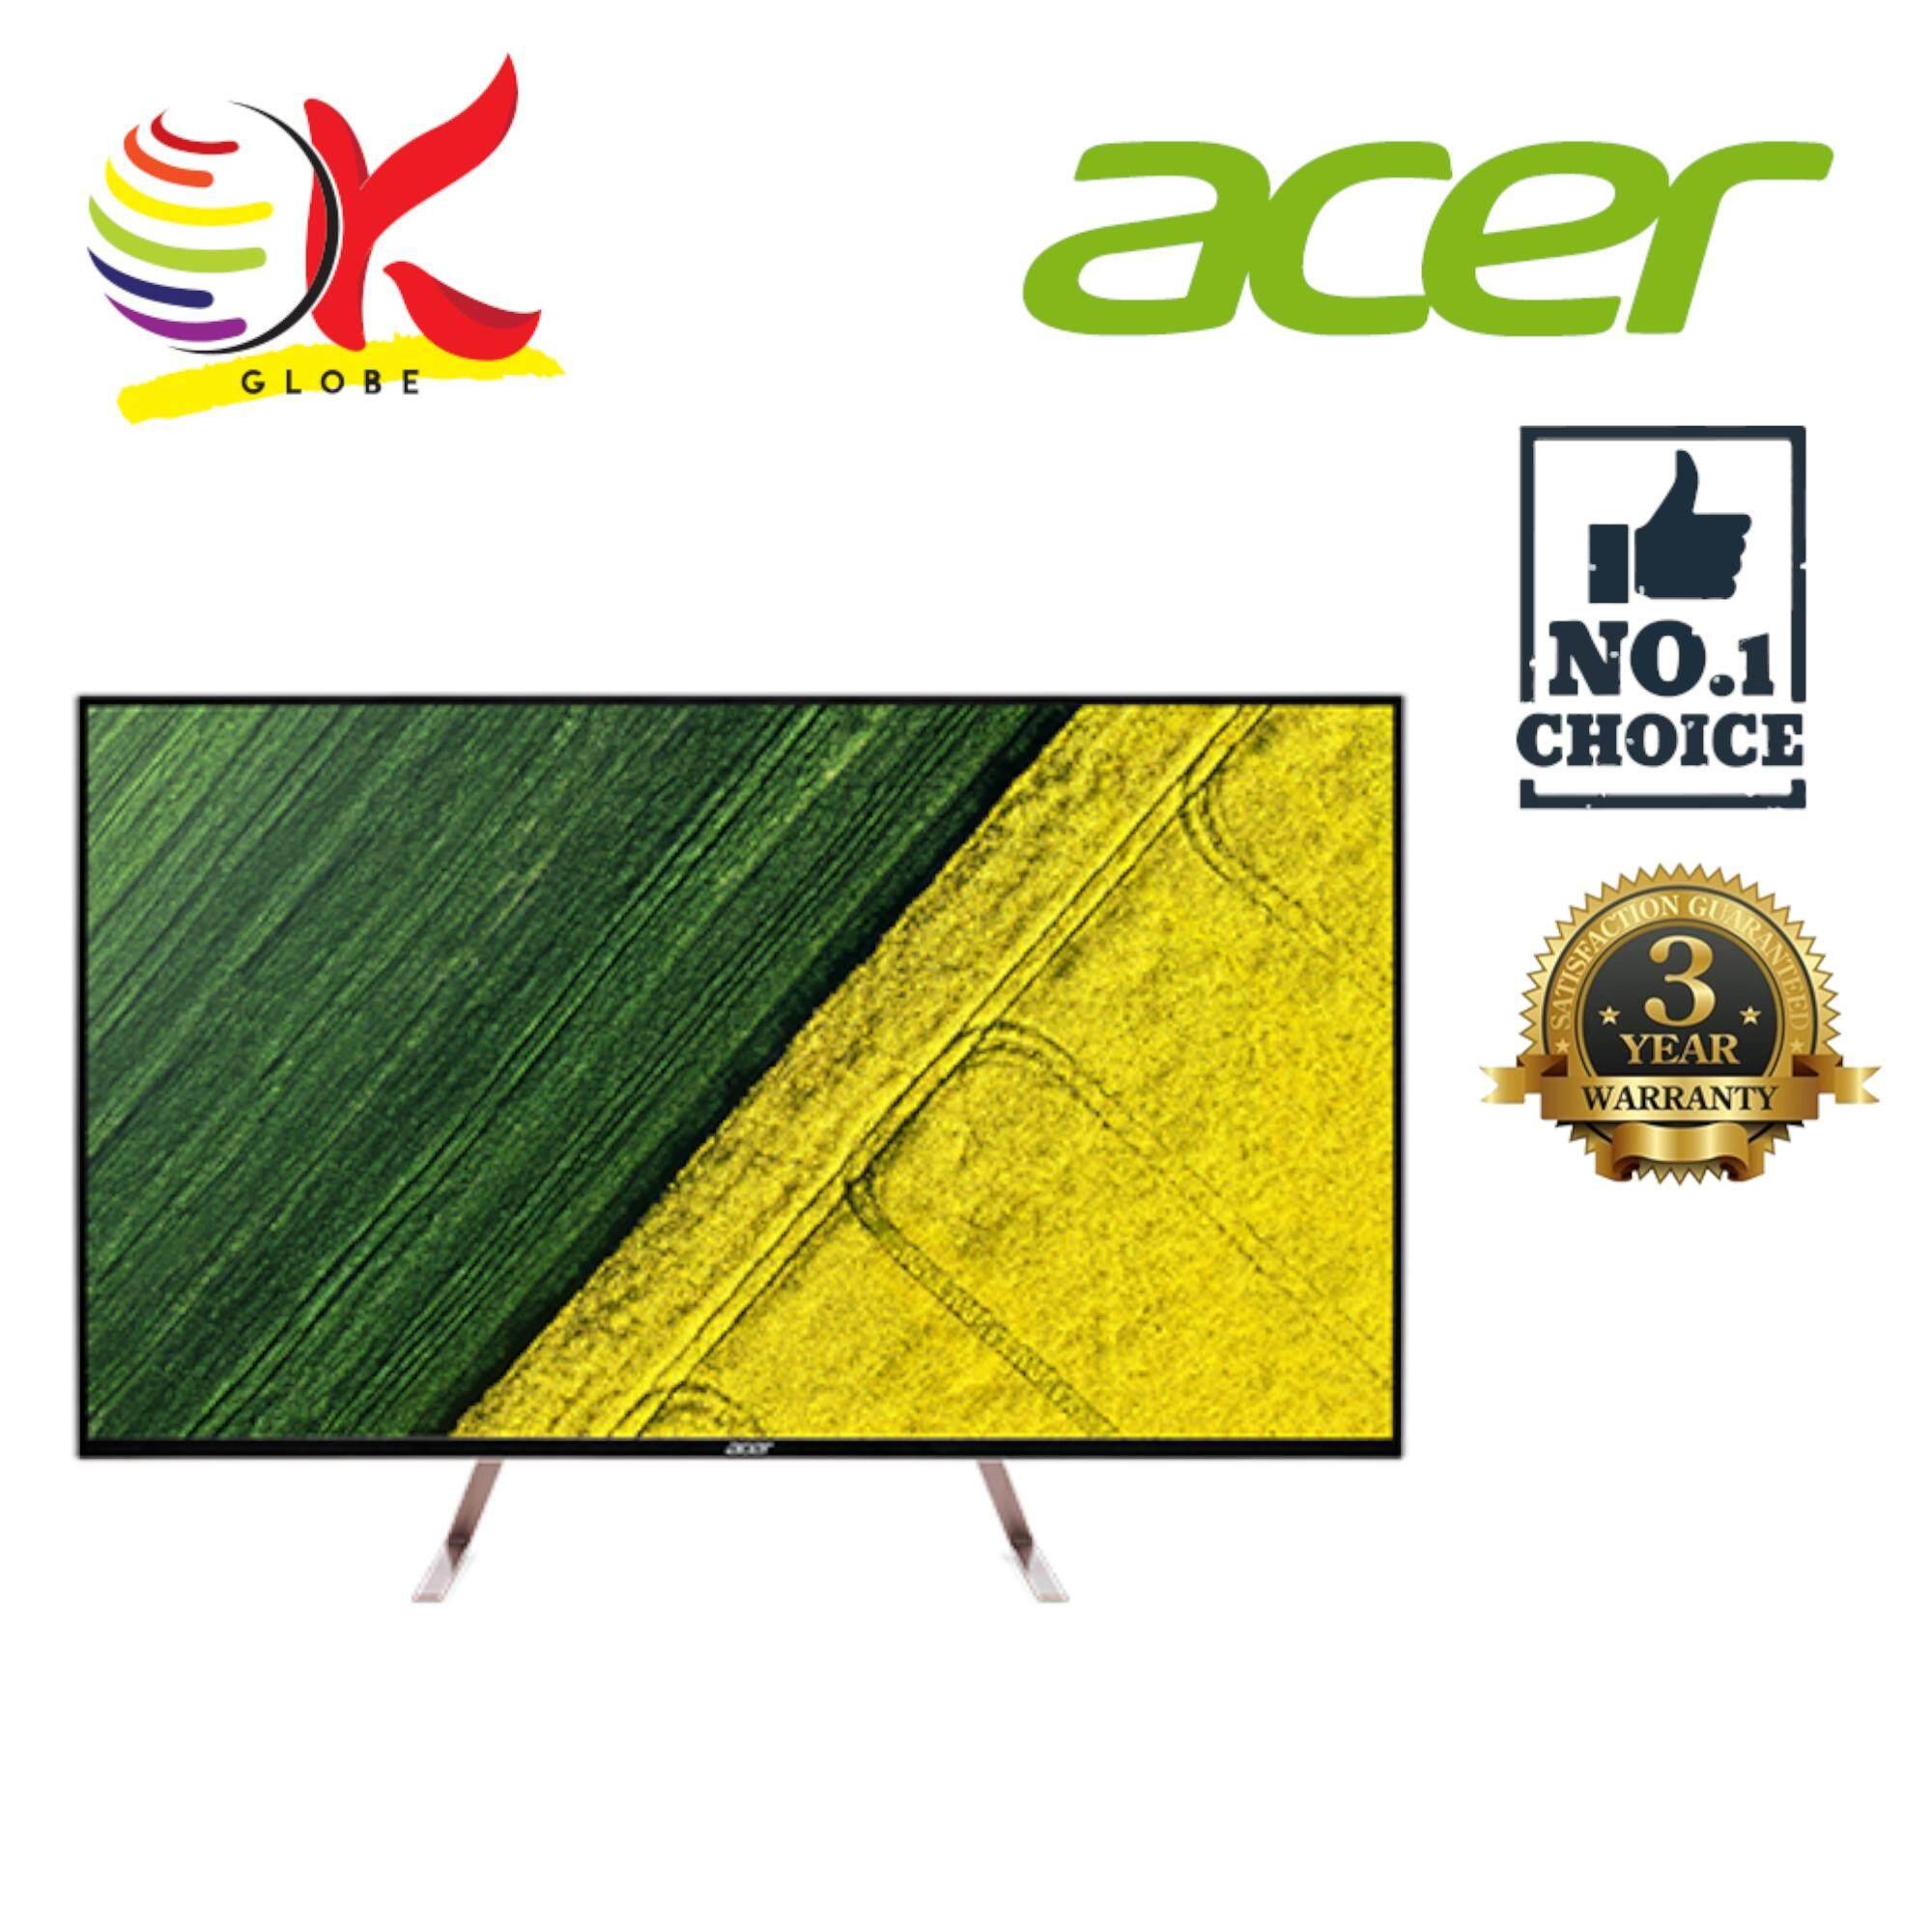 ACER LCD MONITOR LED FLAT IPS UHD 43 ET430K WMIIPP (UM.ME0SM.002) (5MS/HDMIx2/DP/MINI-DP/DP-OUT/VESA/SPK/HDR) BLACK Malaysia